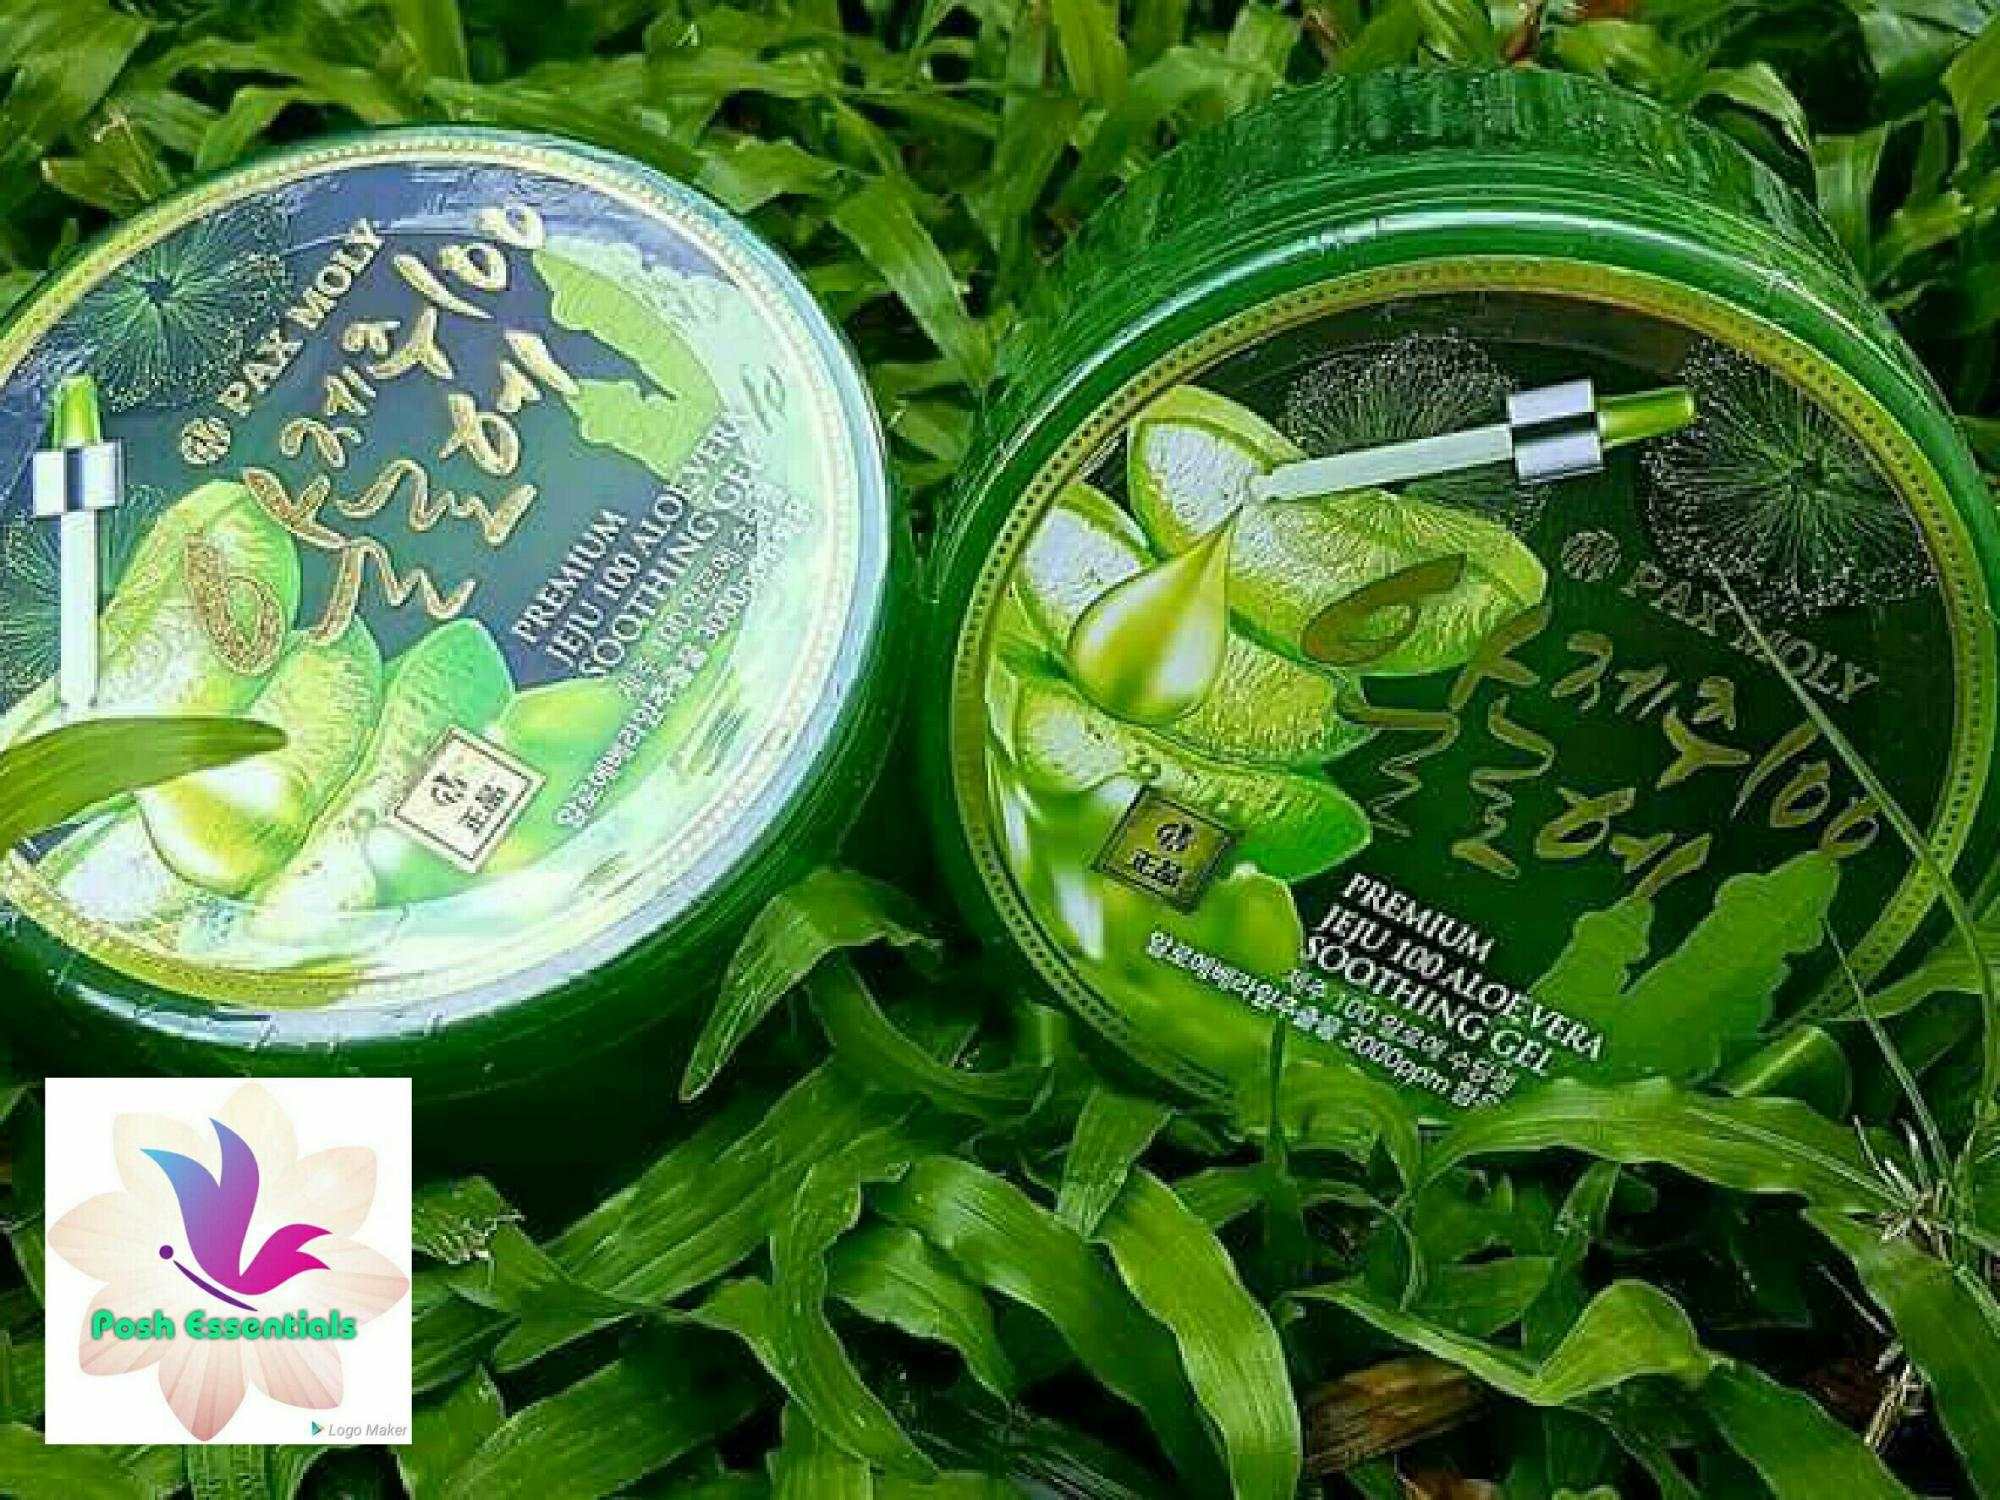 Nature Republic Aloe Vera Soothing Gel Buy 1 Take Fesyen Bioaqua Shooting Original Pax Moly Premium Jeju 100 300g